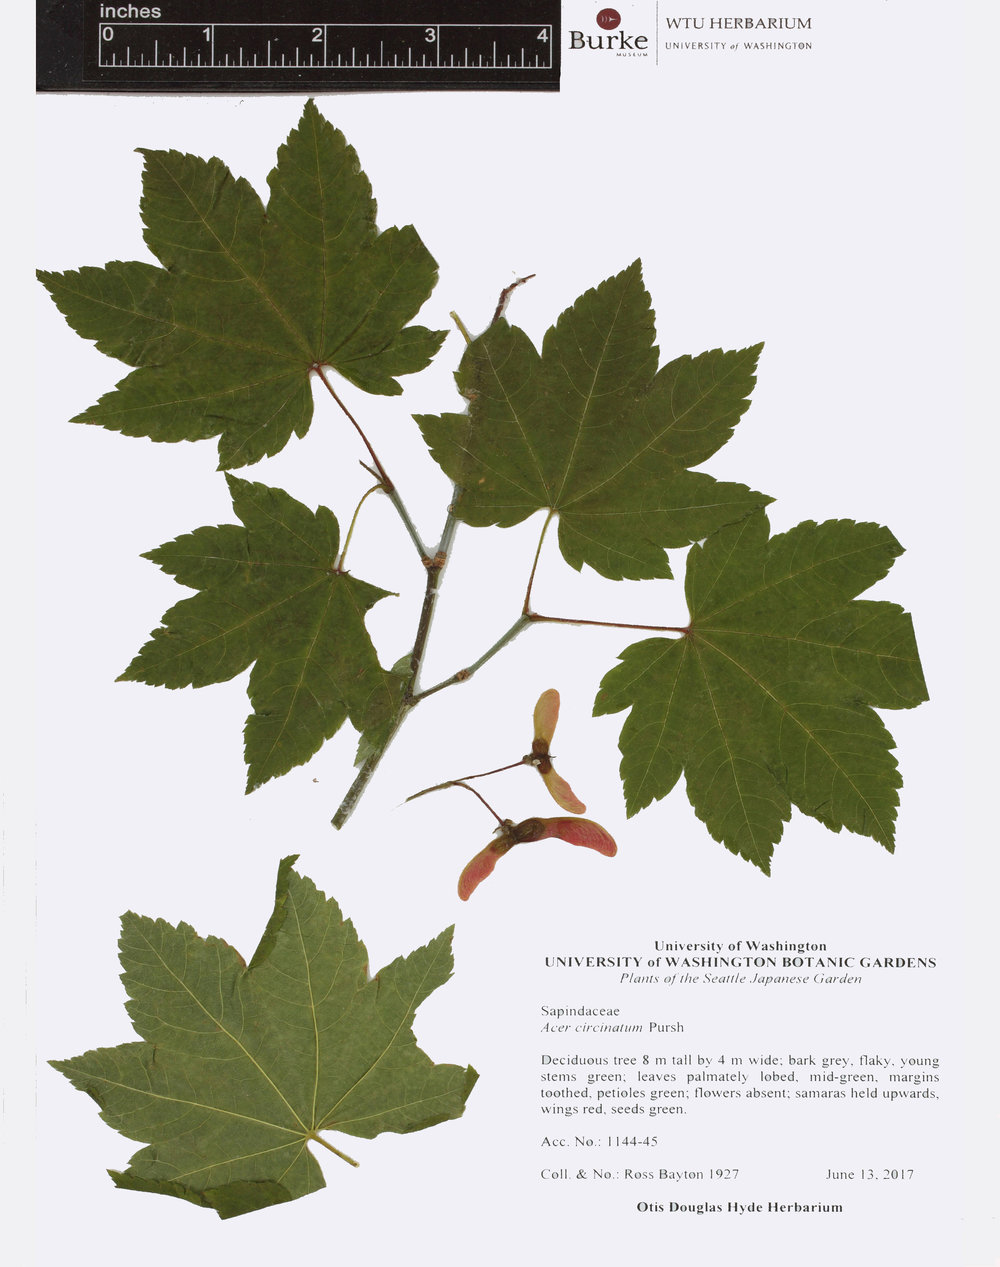 circinatum-7.5x9.jpg